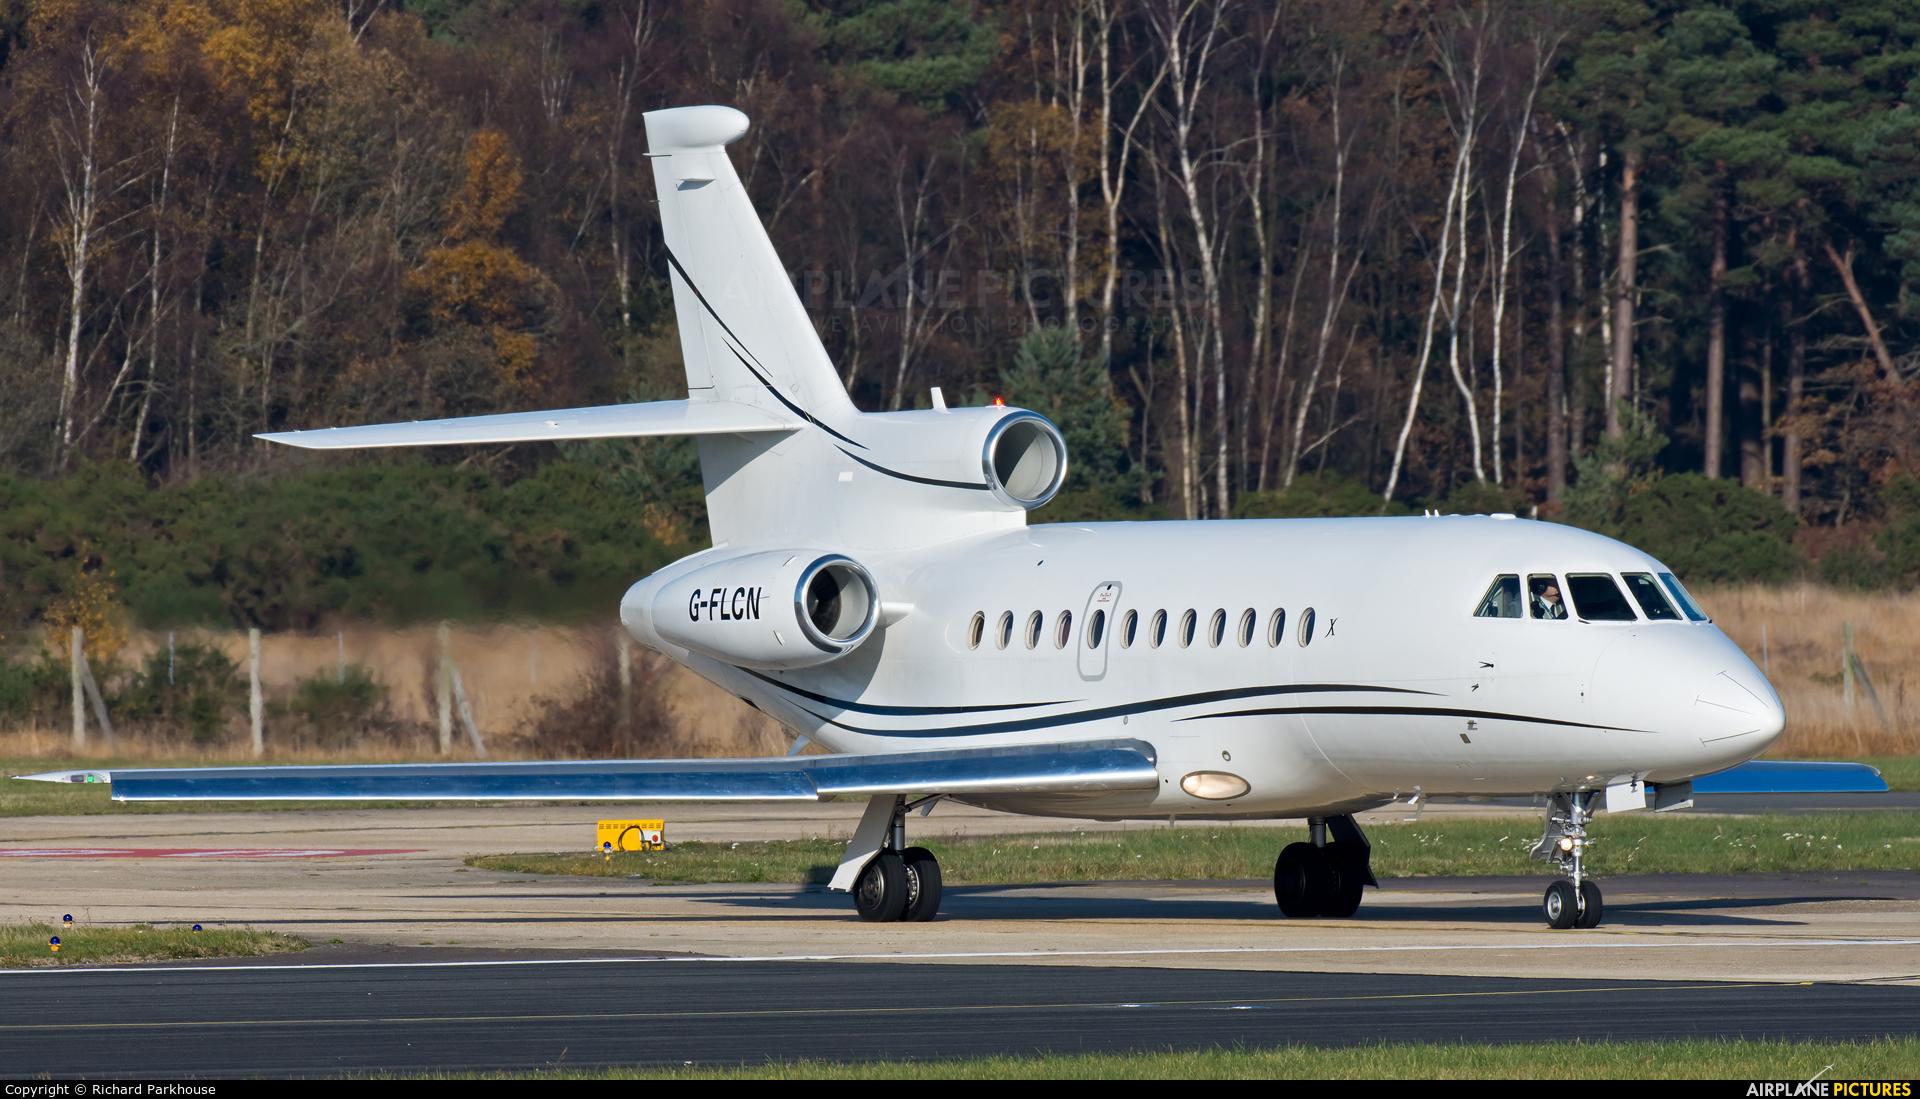 Xclusive Jet Charter G-FLCN aircraft at Farnborough